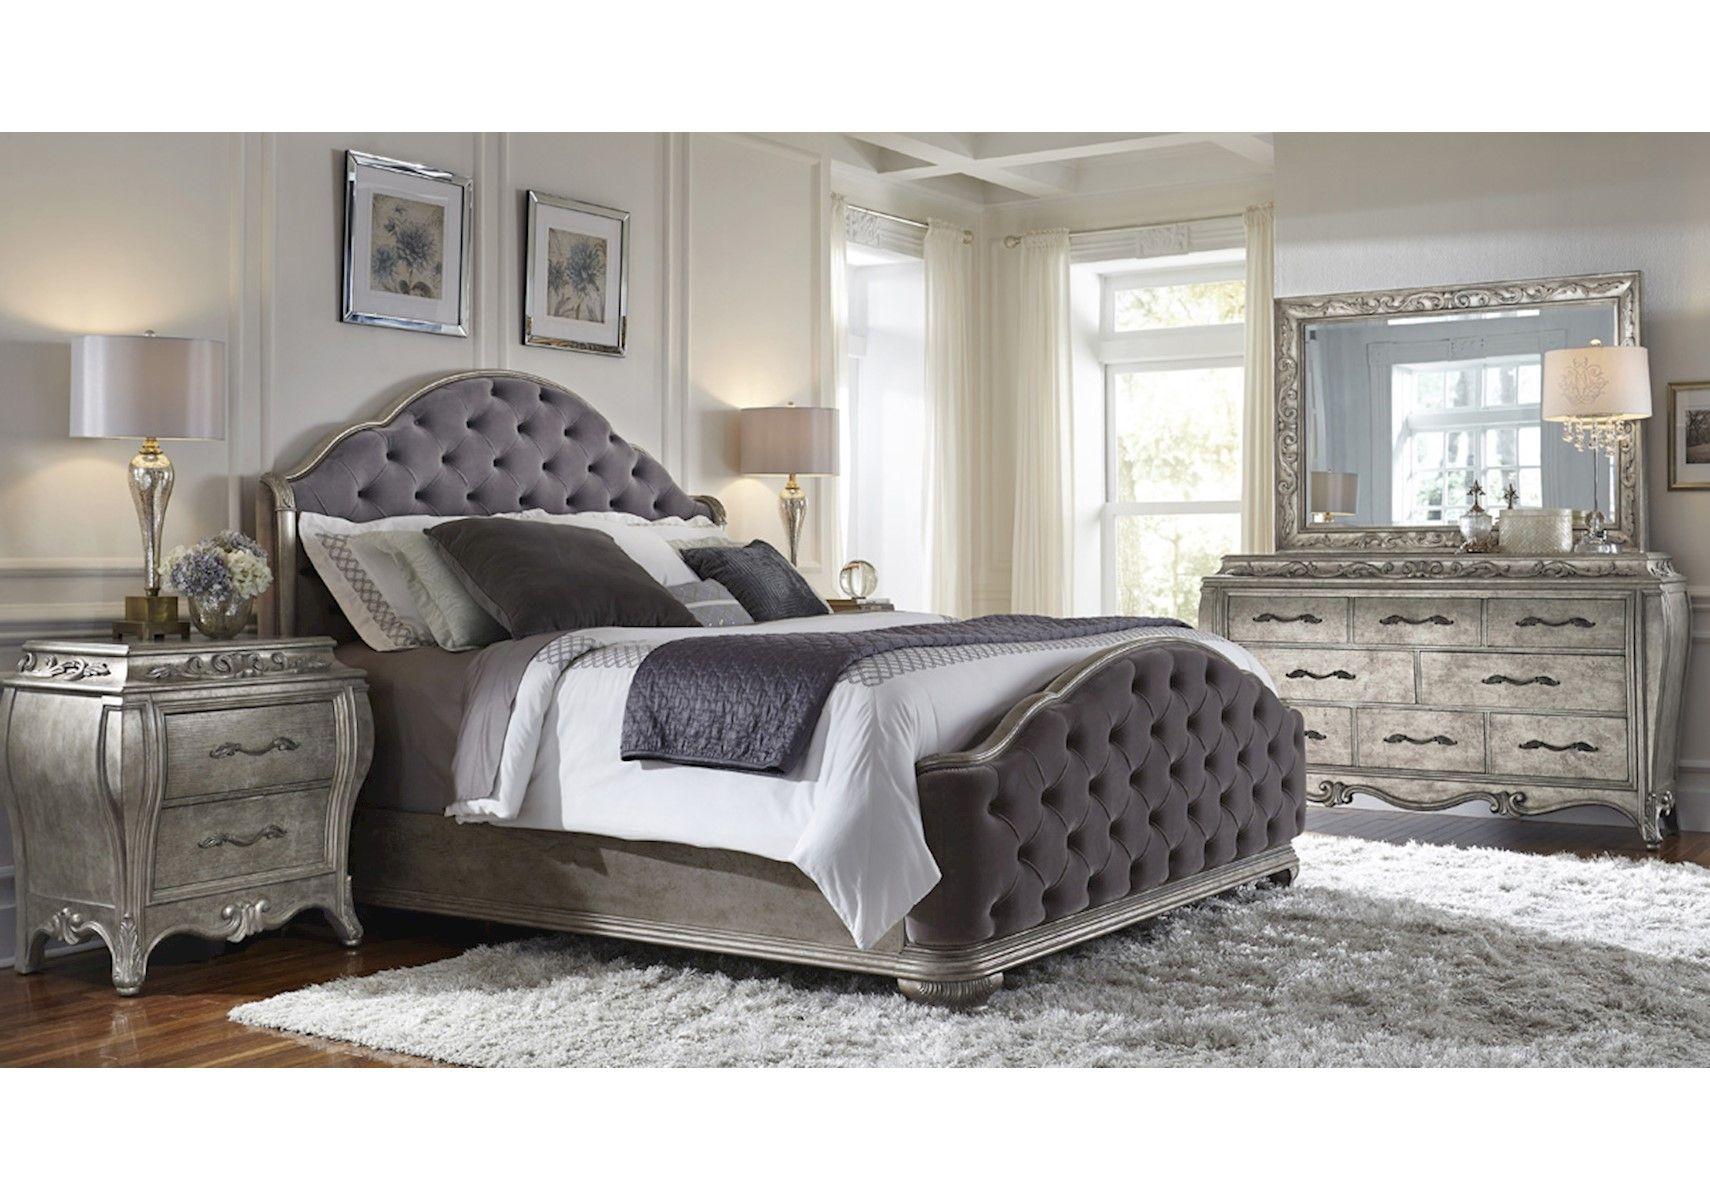 Lacks   Tuscany Valley 4 Pc Queen Bedroom Set   Transitional Style Home    Pinterest   Queen Bedroom Sets, Queen Bedroom And Bedrooms